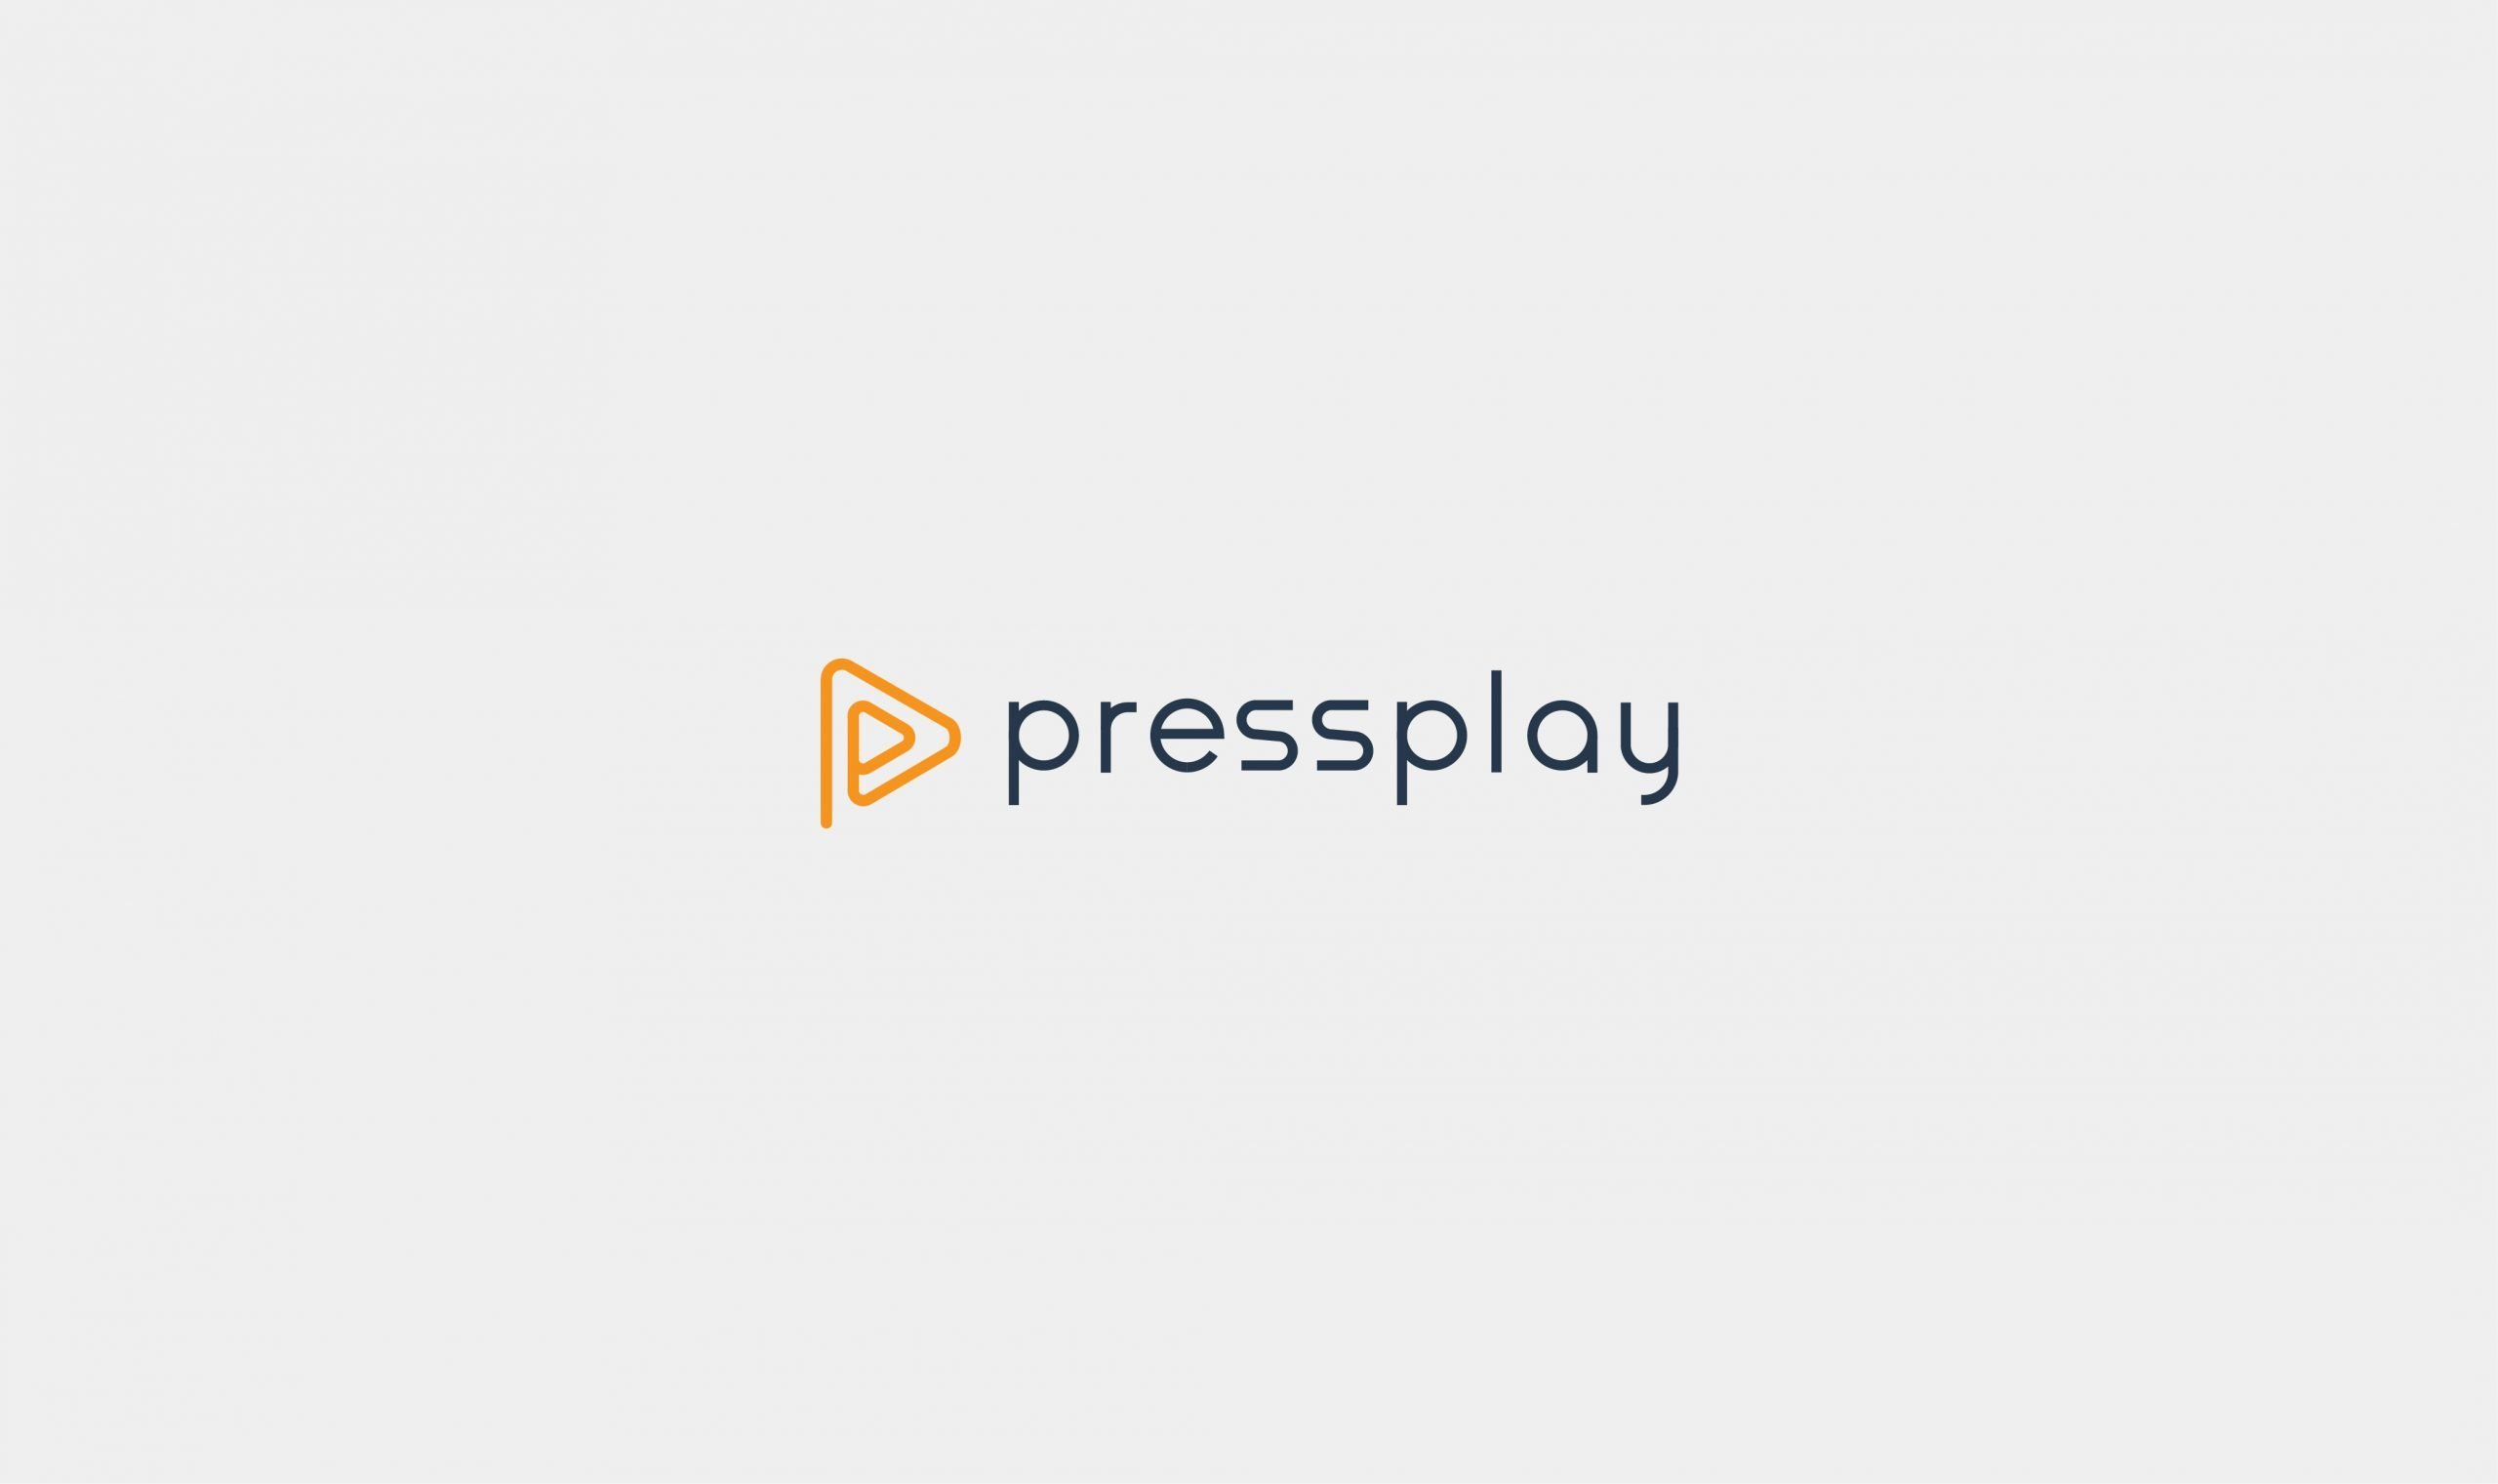 Pressplay 1